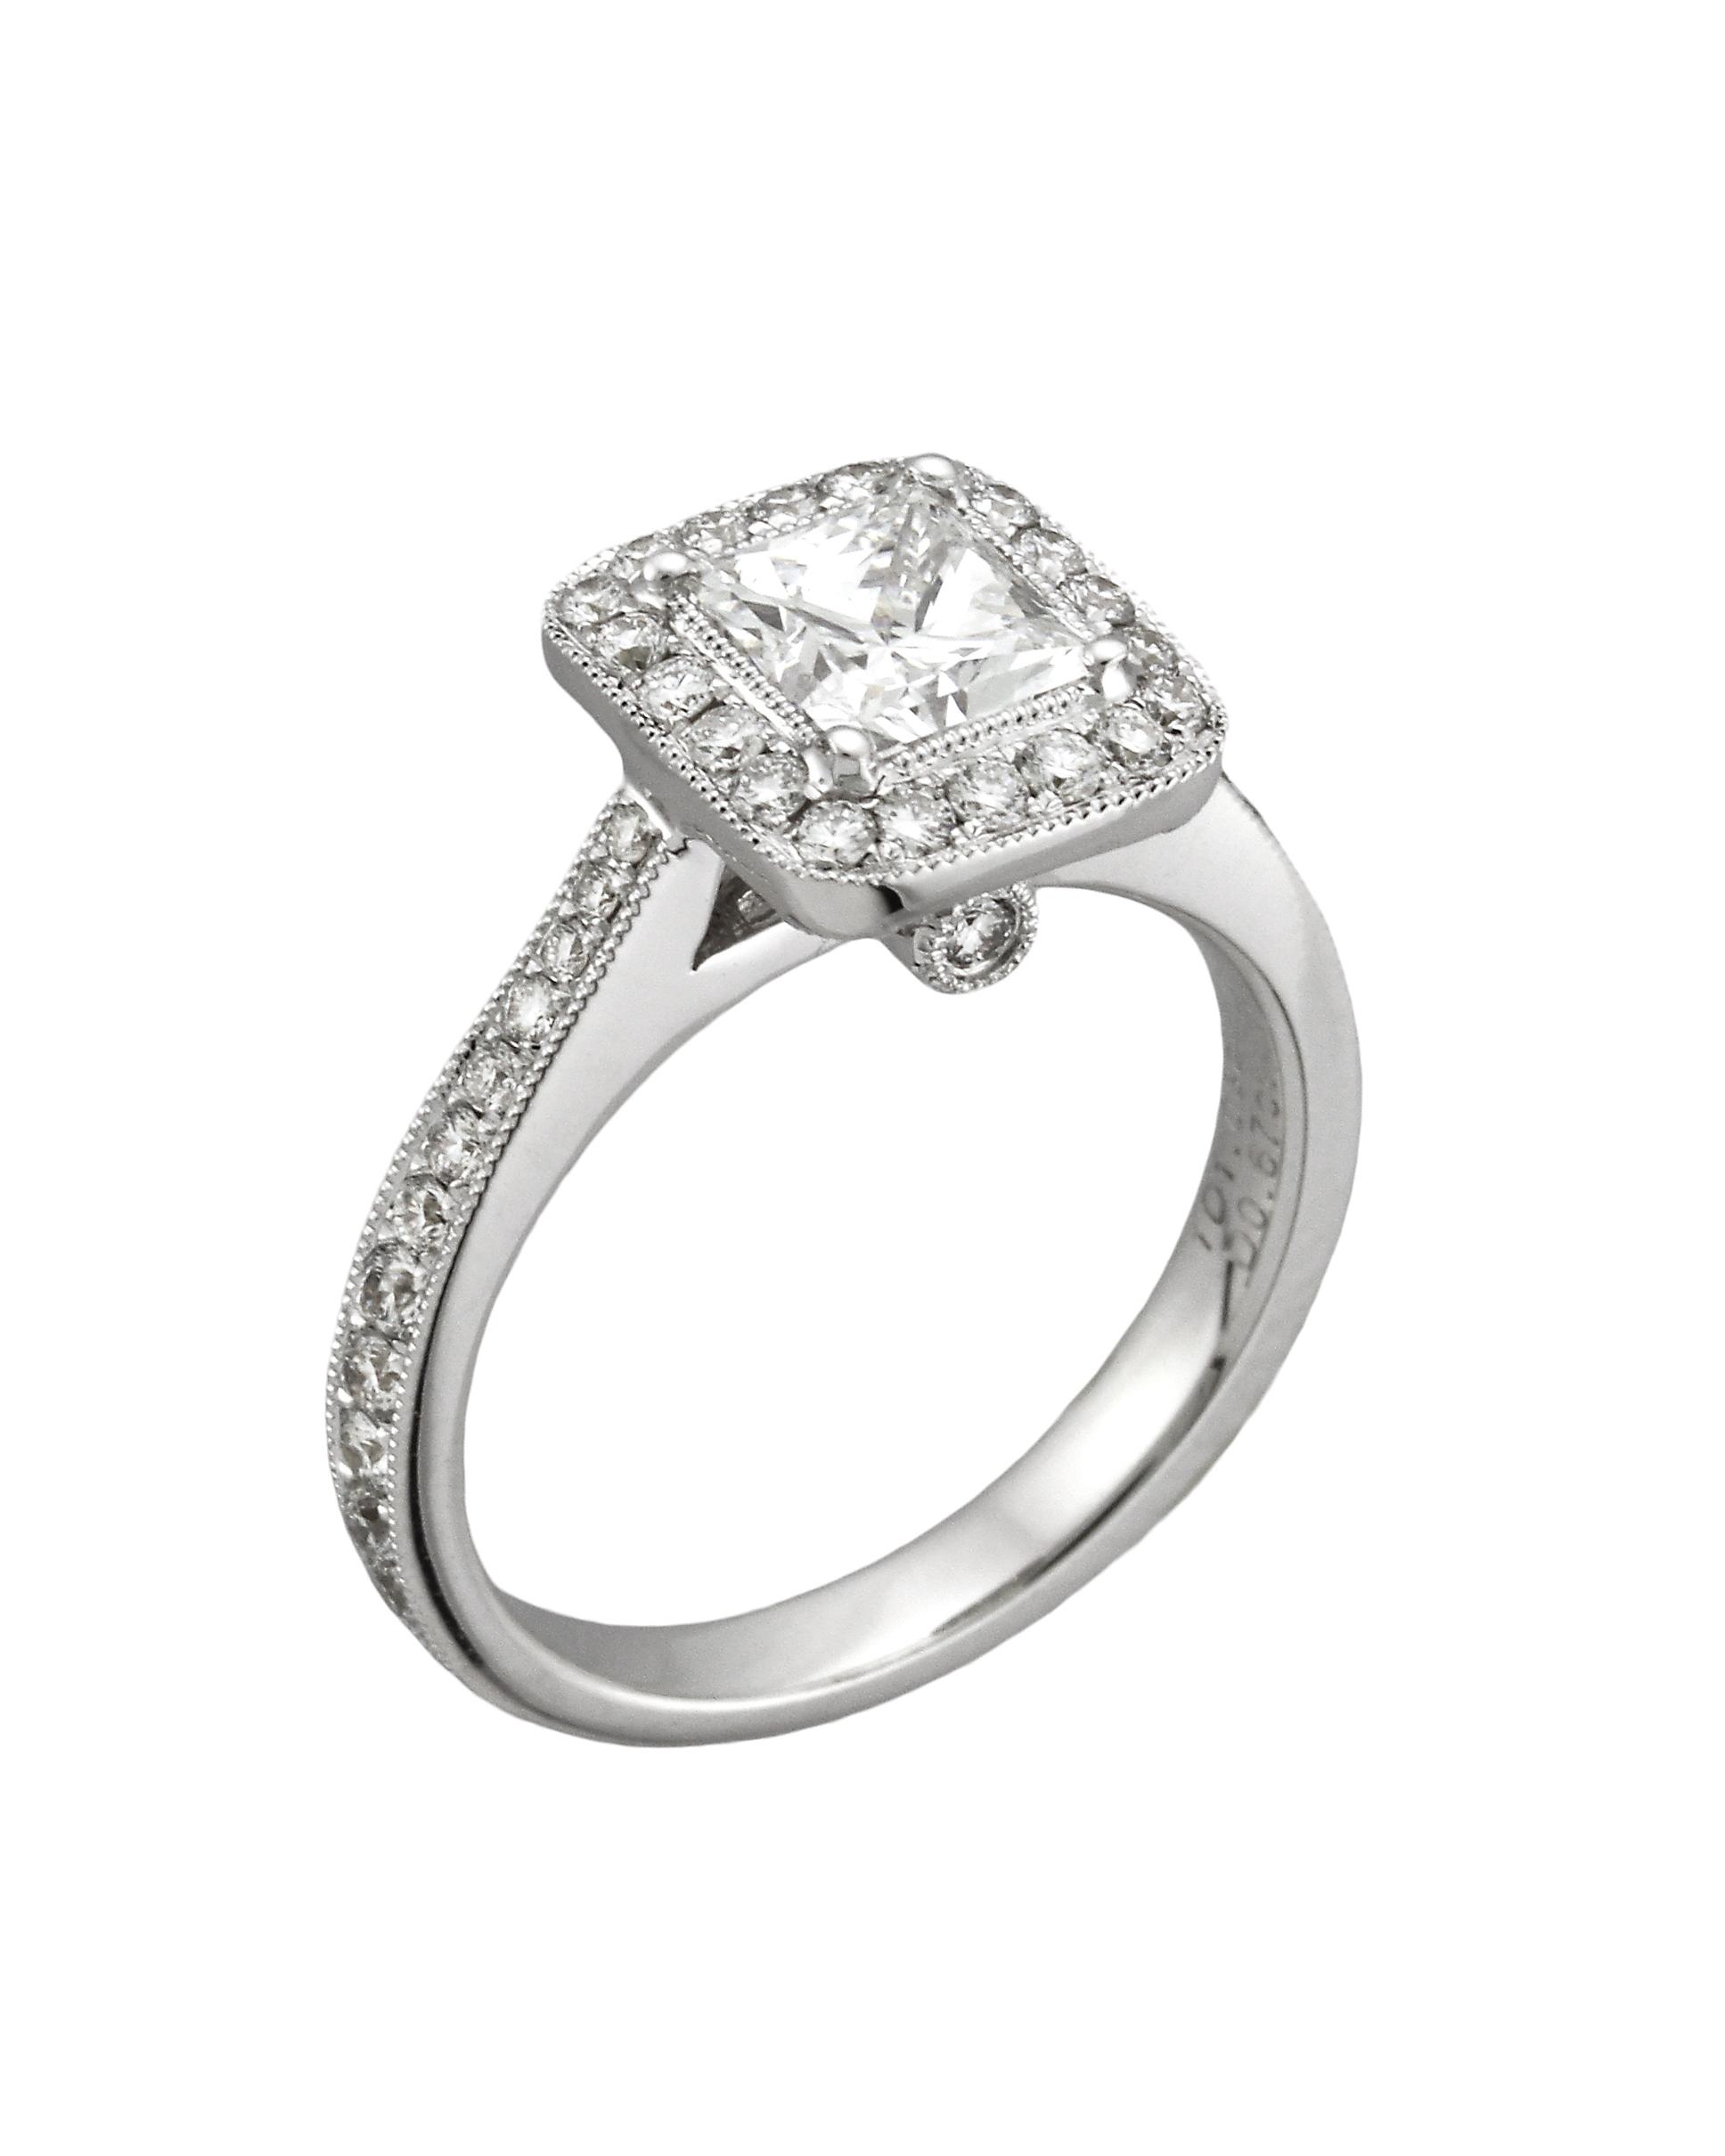 yael-designs-princess-cut-engagement-ring-one-0816.jpg